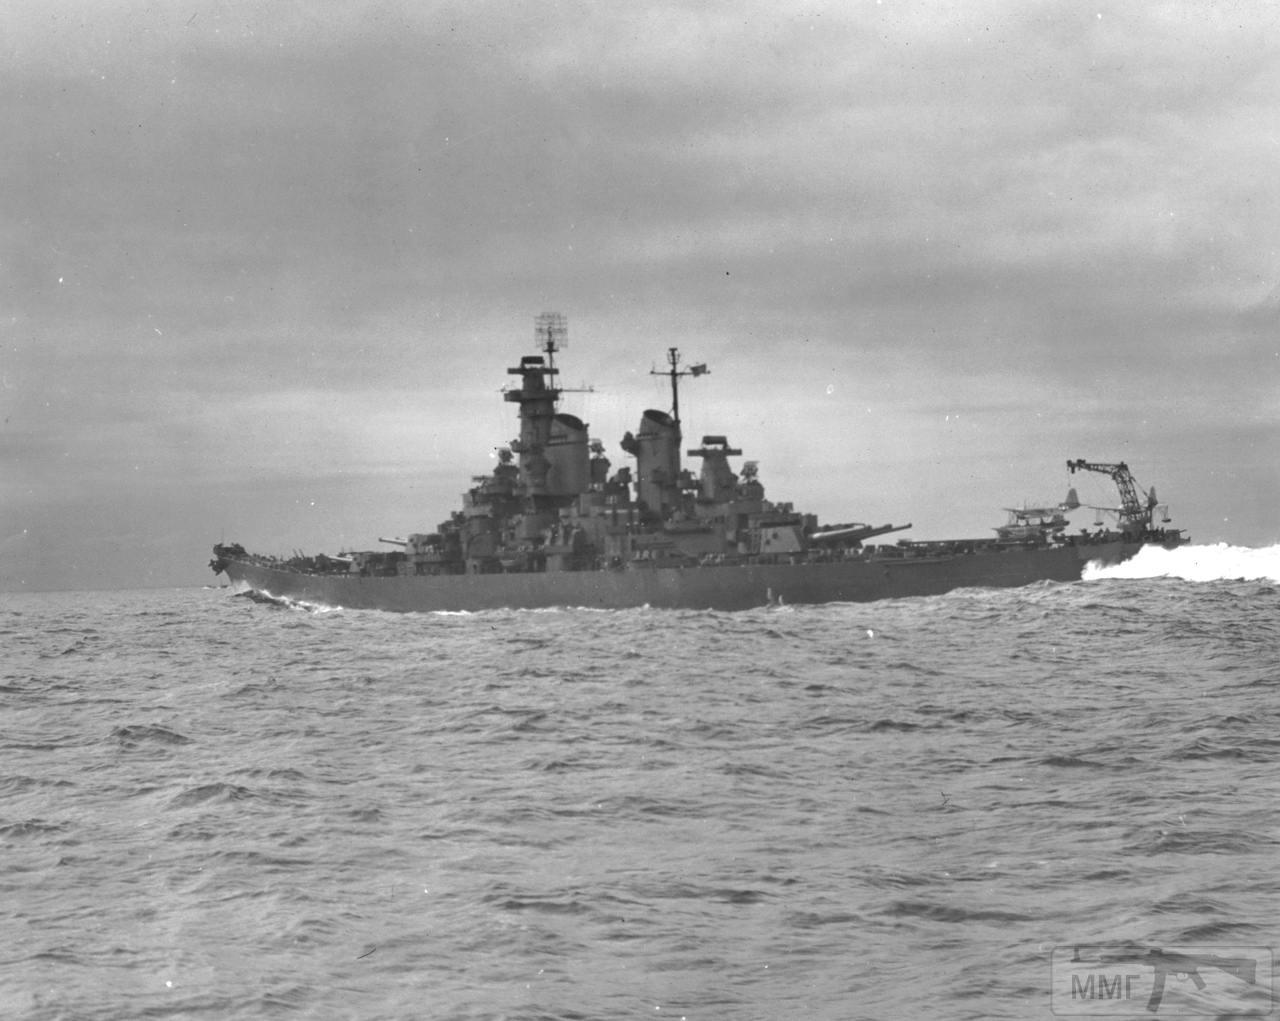 80804 - USS New Jersey (BB-62)